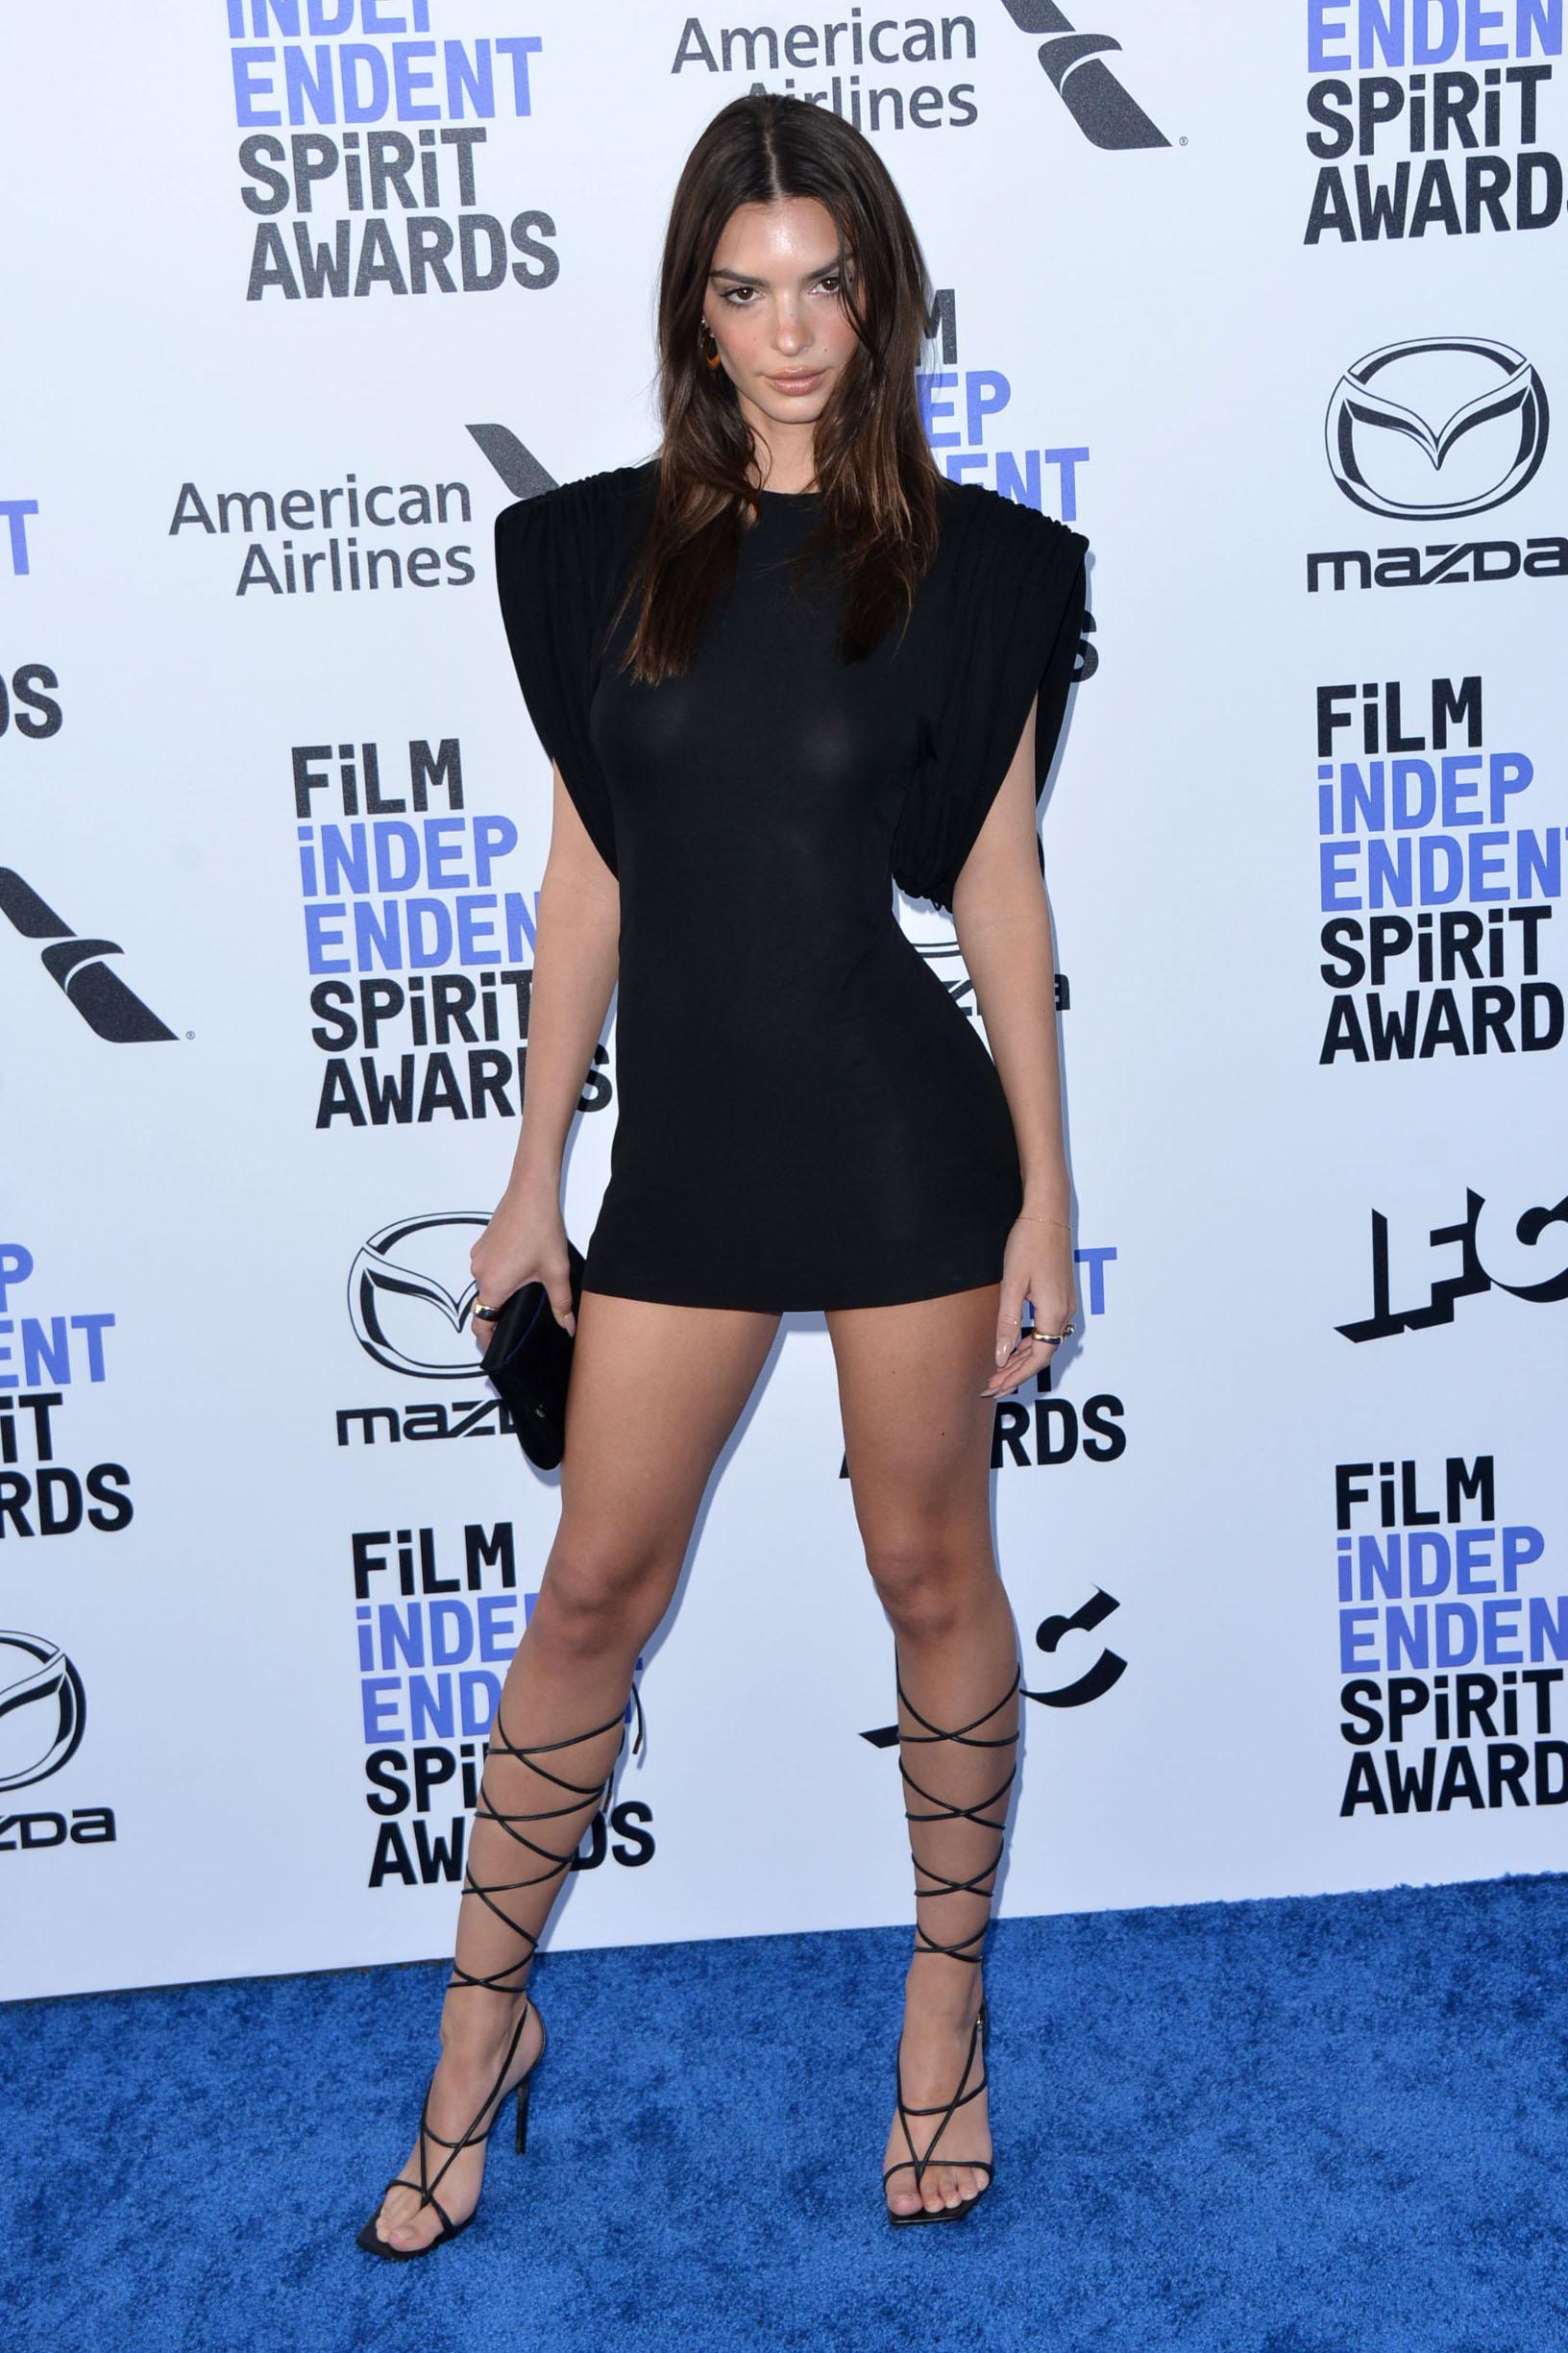 2020 Film Independent Spirit Awards. 08 Feb 2020, Image: 497293261, License: Rights-managed, Restrictions: World Rights, Model Release: no, Credit line: Tony DiMaio/MEGA / The Mega Agency / Profimedia